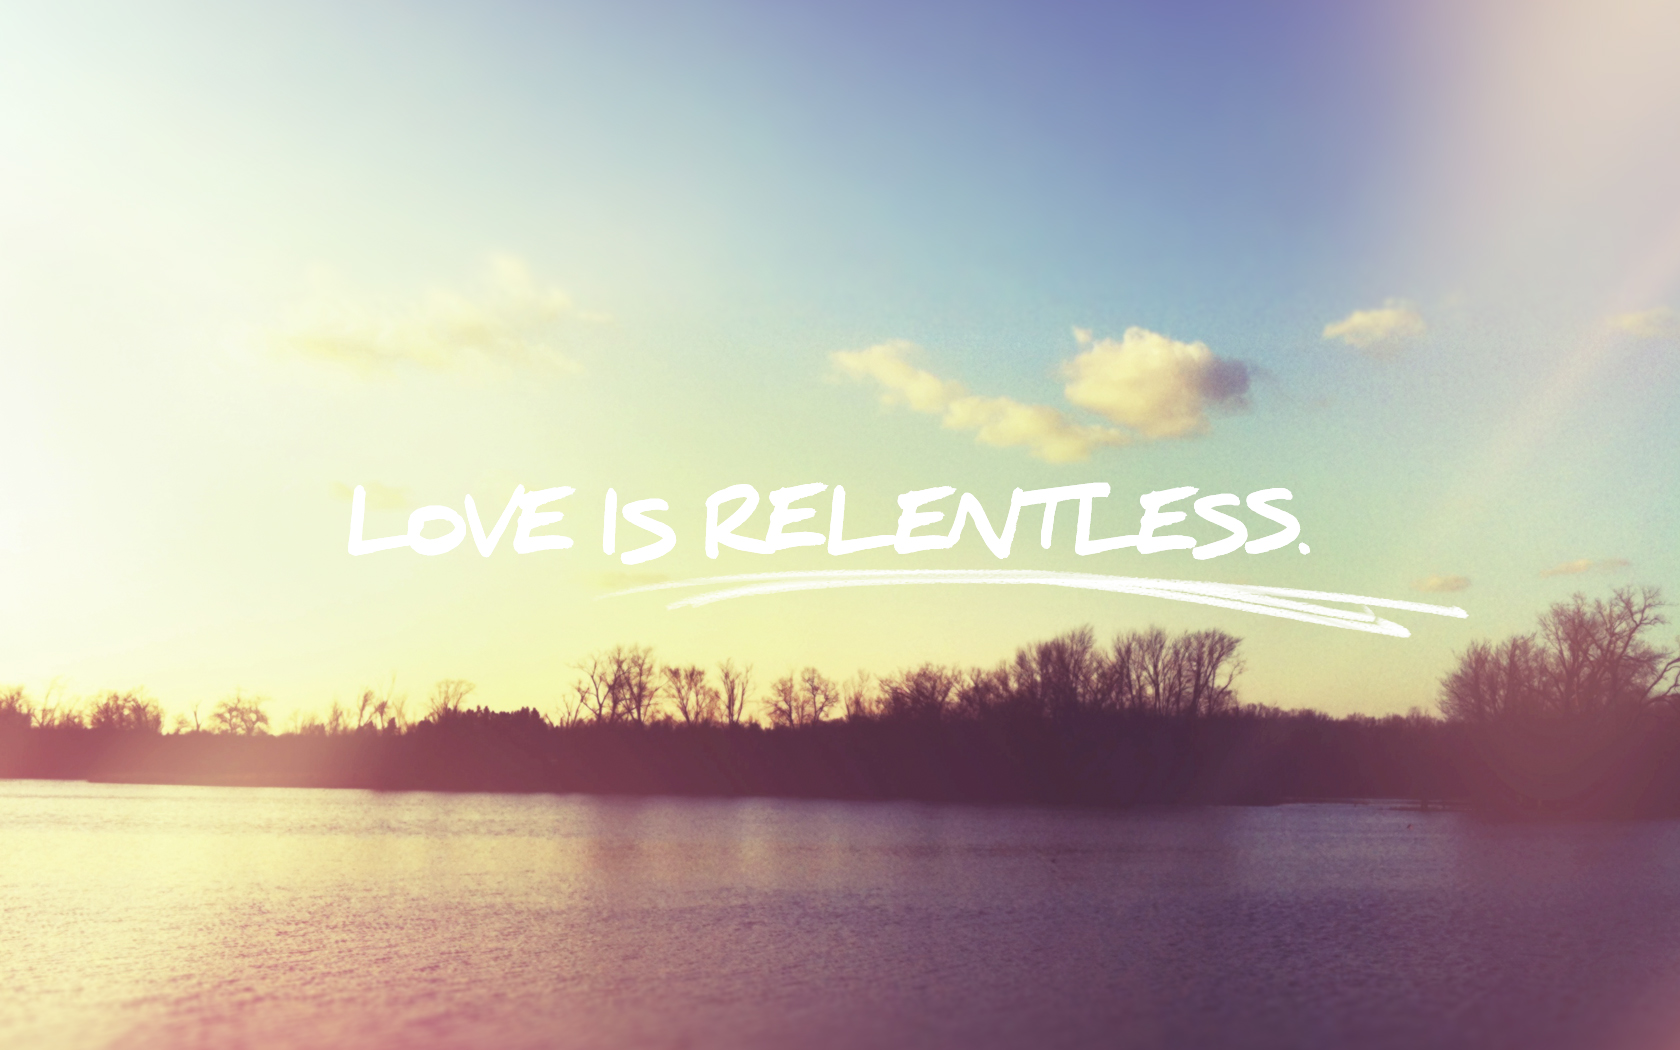 Relentless from Hillsong Joy in my Heart Pinterest 1680x1050